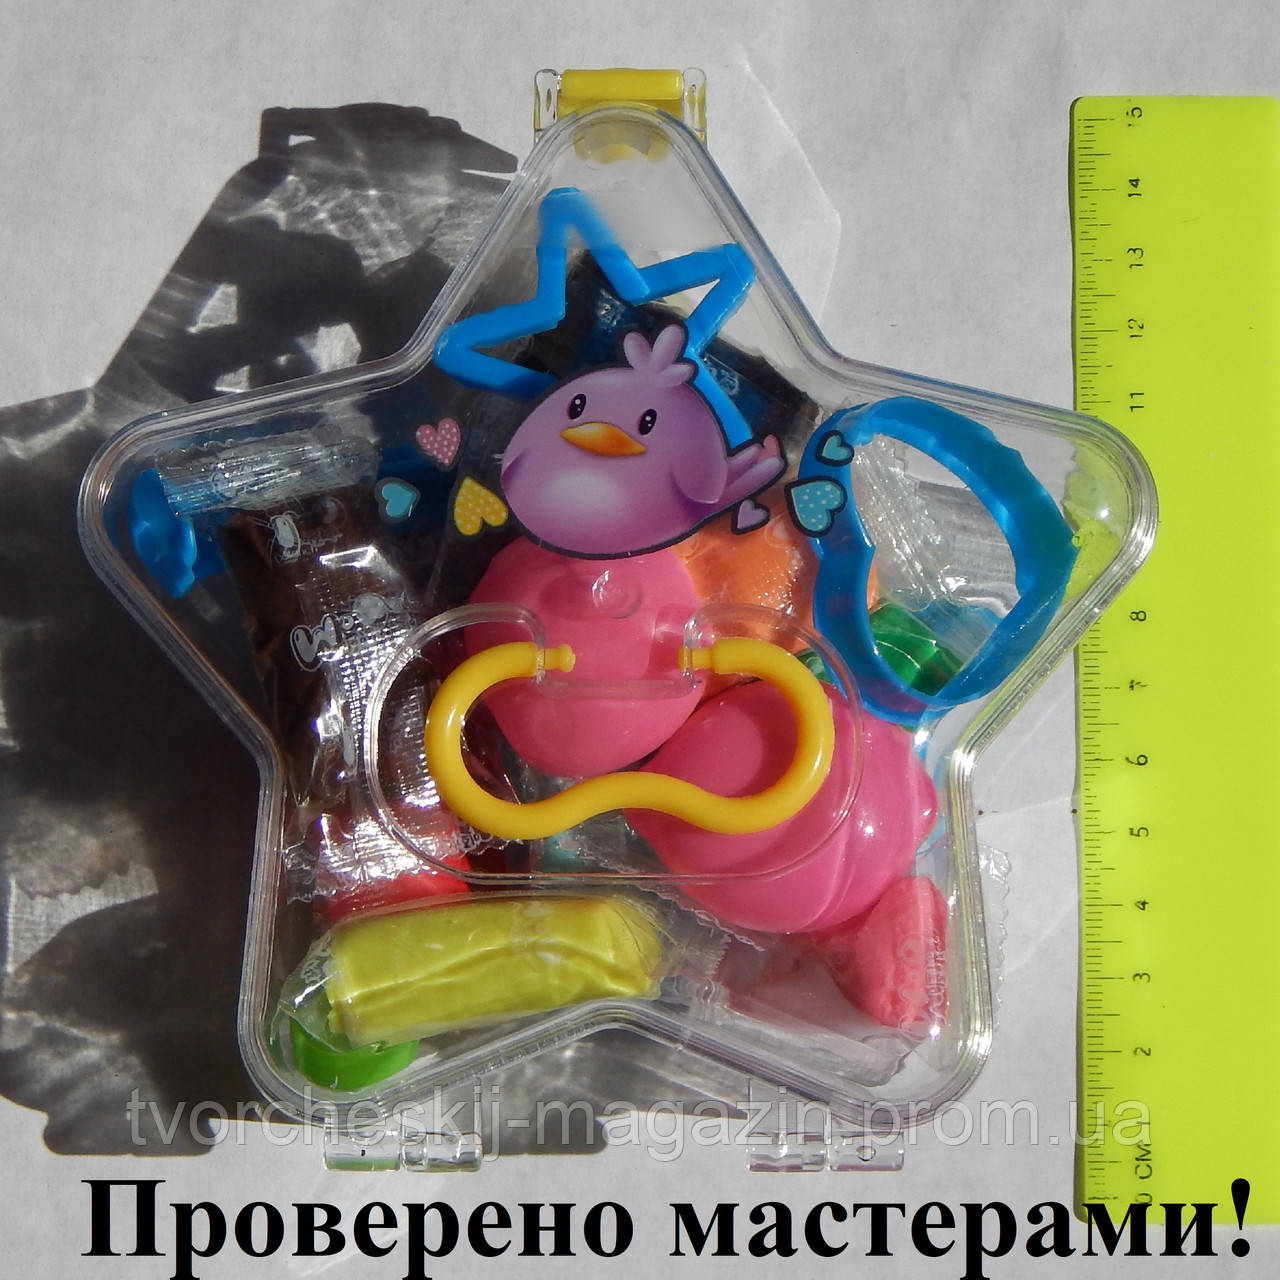 "Набор для лепки в коробке ""Звезда"", 12 цветов волшебного пластилина, формочки, шприц, стек ""Peppy Pinto"""